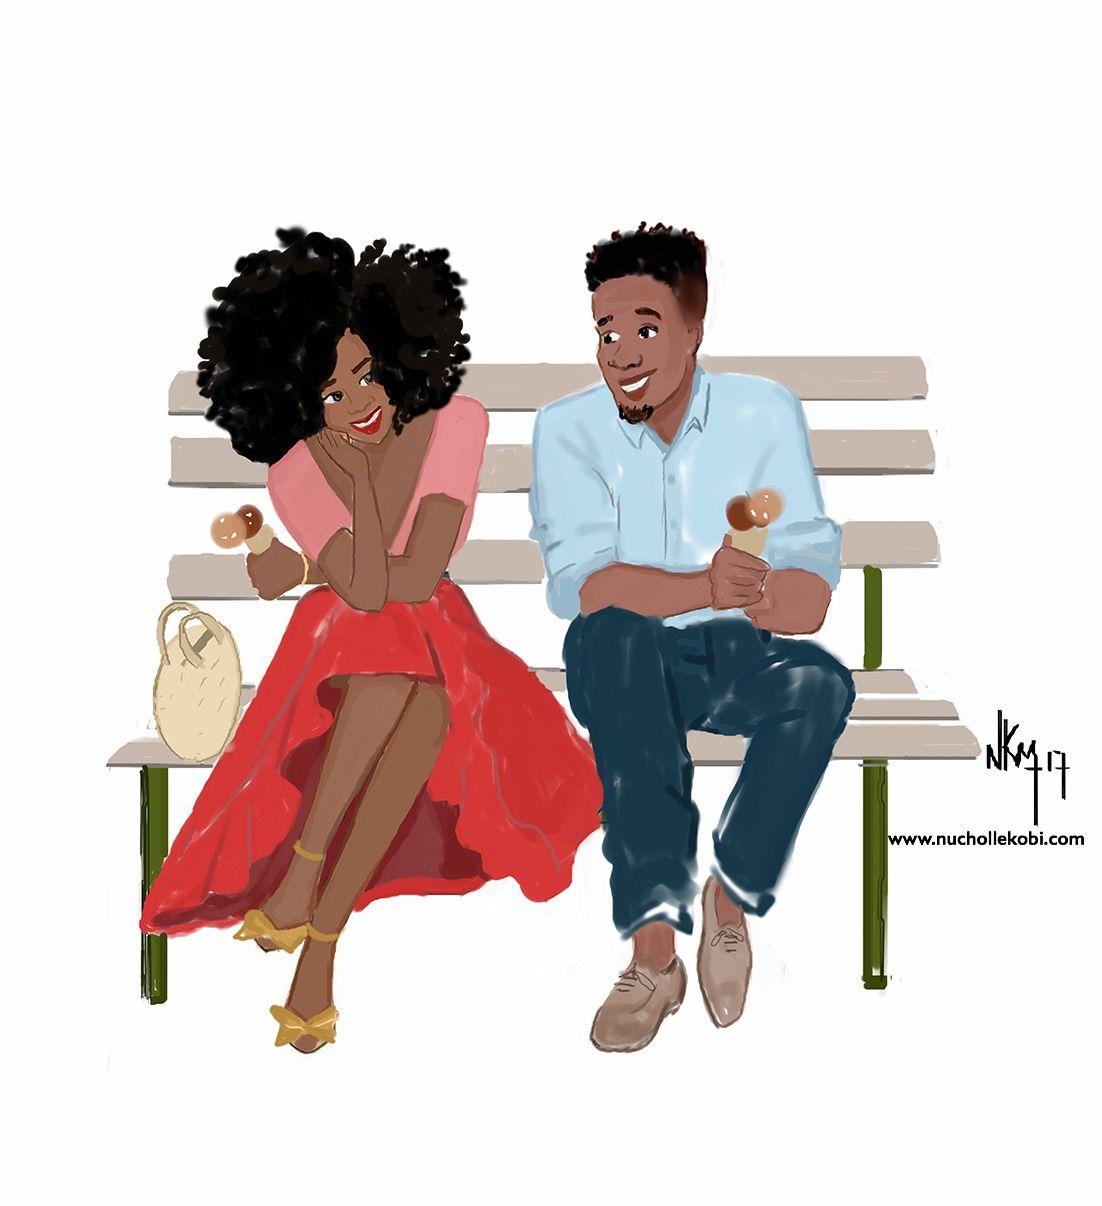 www.nichollekobi.com   NATURART   Pinterest   Arte afro, Afro y ...